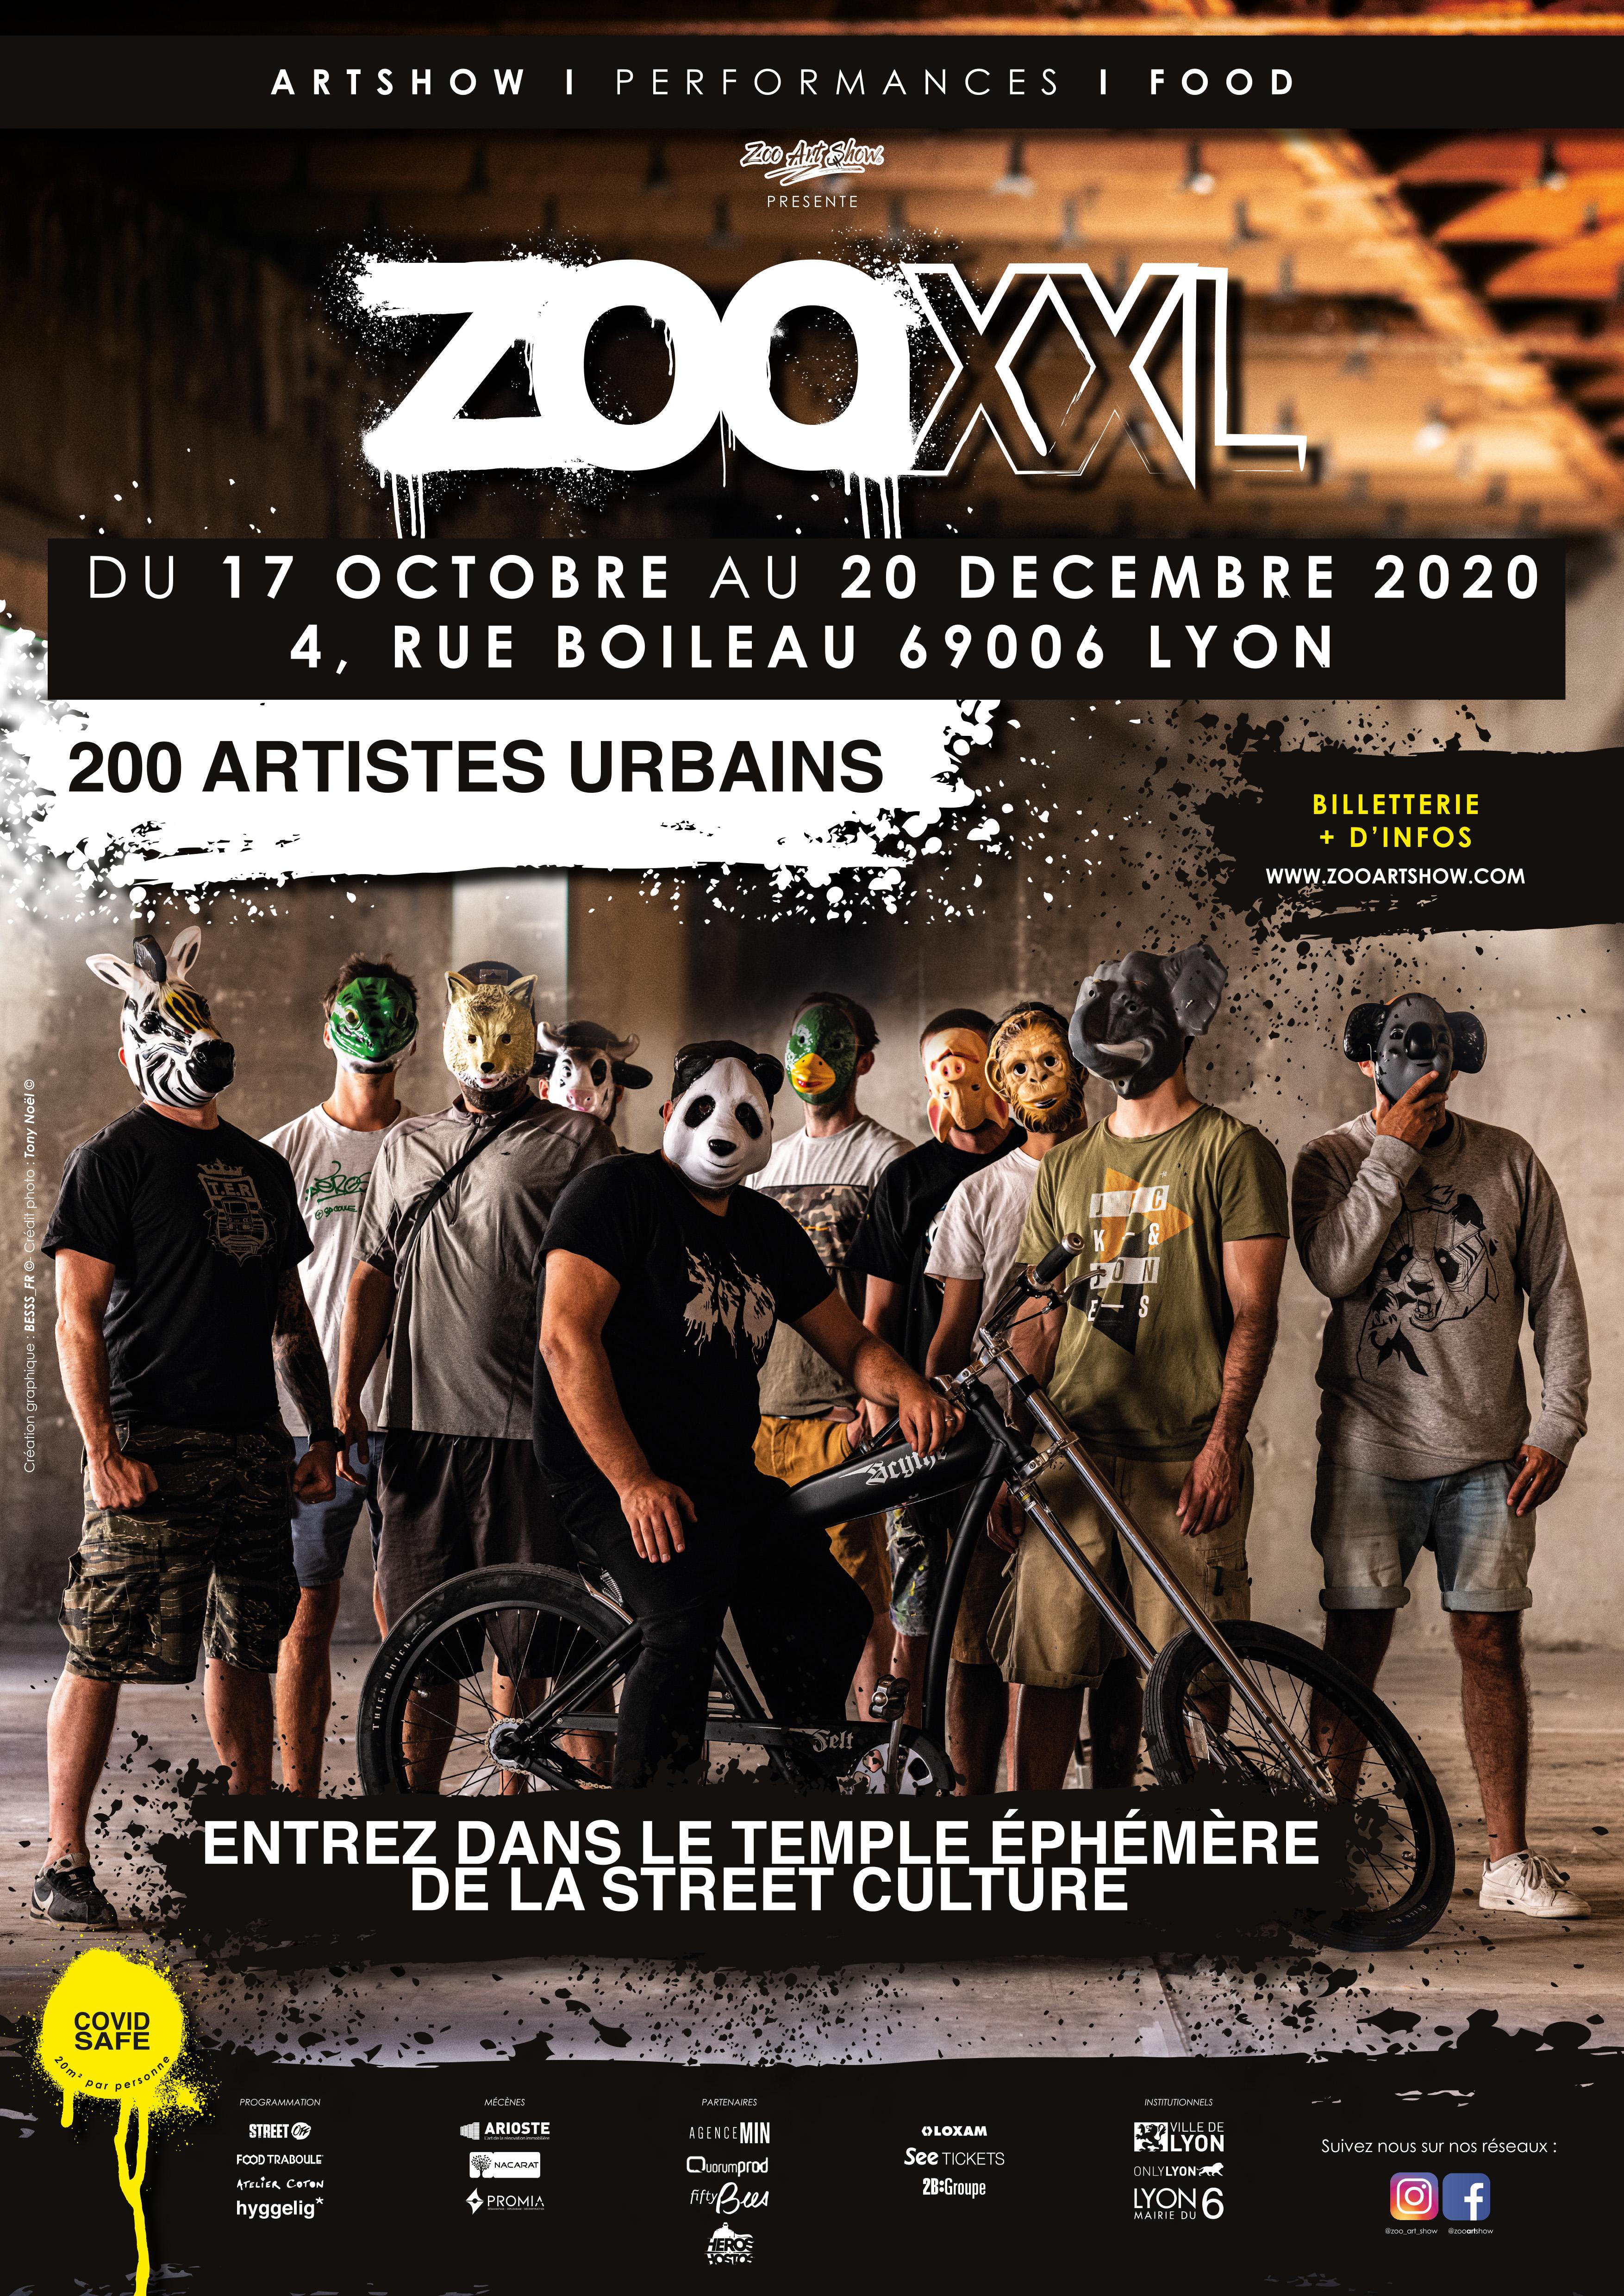 ZOO_affiche_280920_Ville_de_LYON_basse_def.jpg